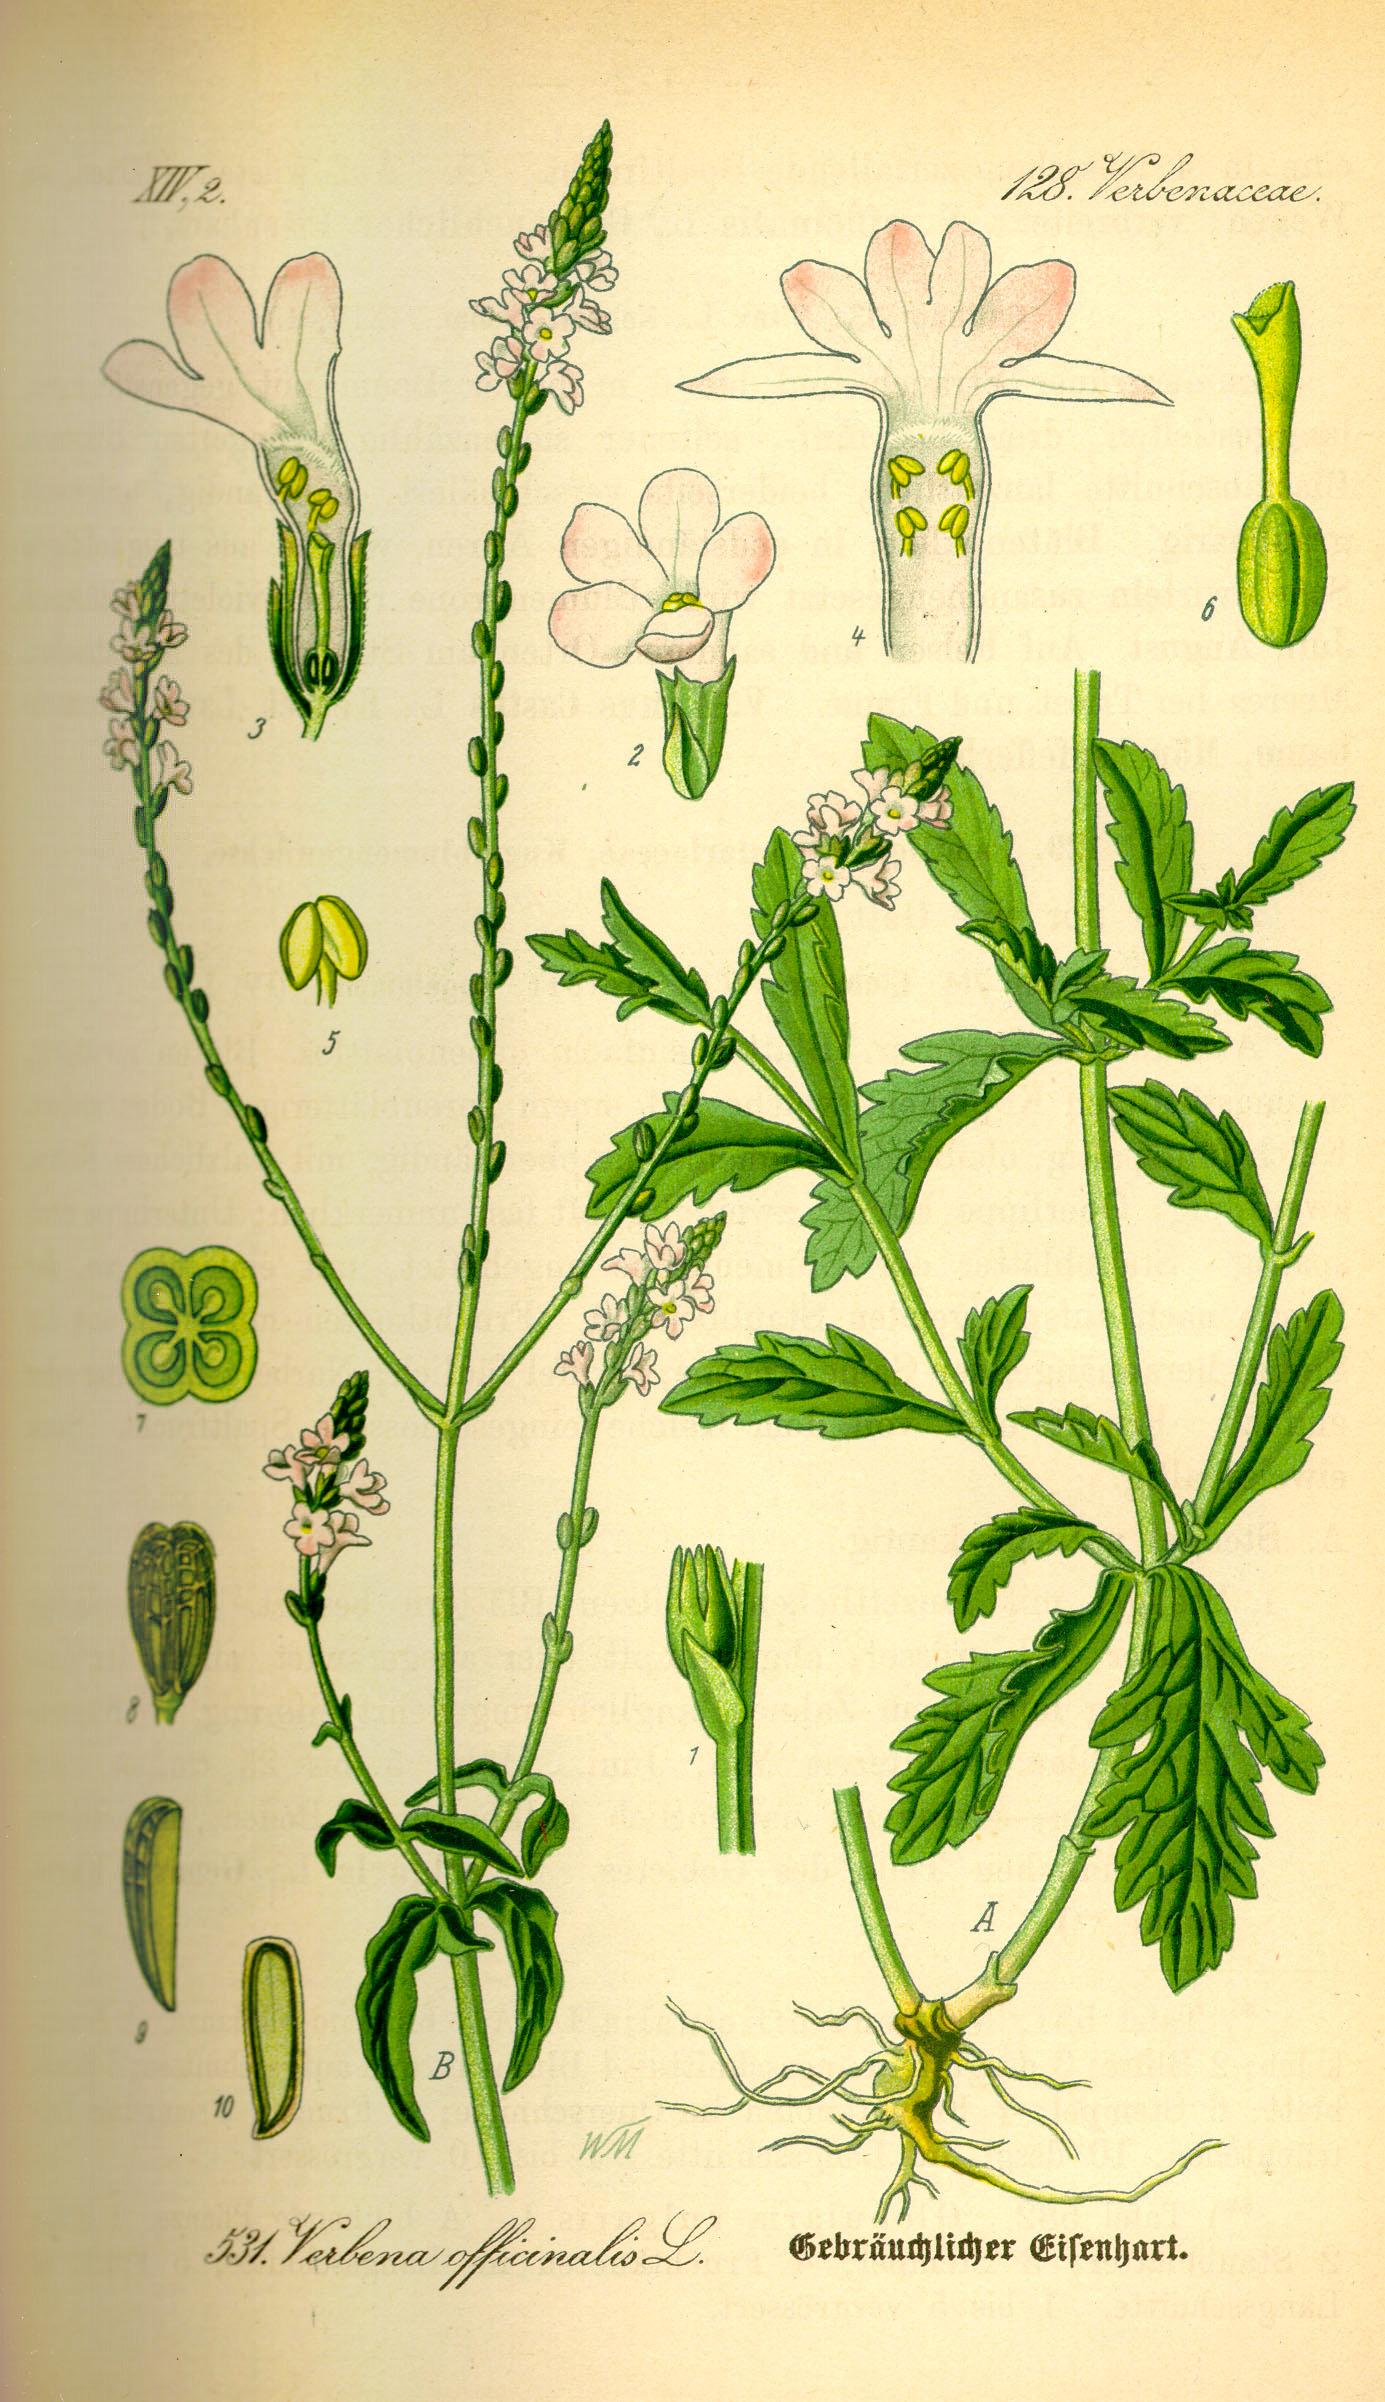 Depiction of Verbena officinalis